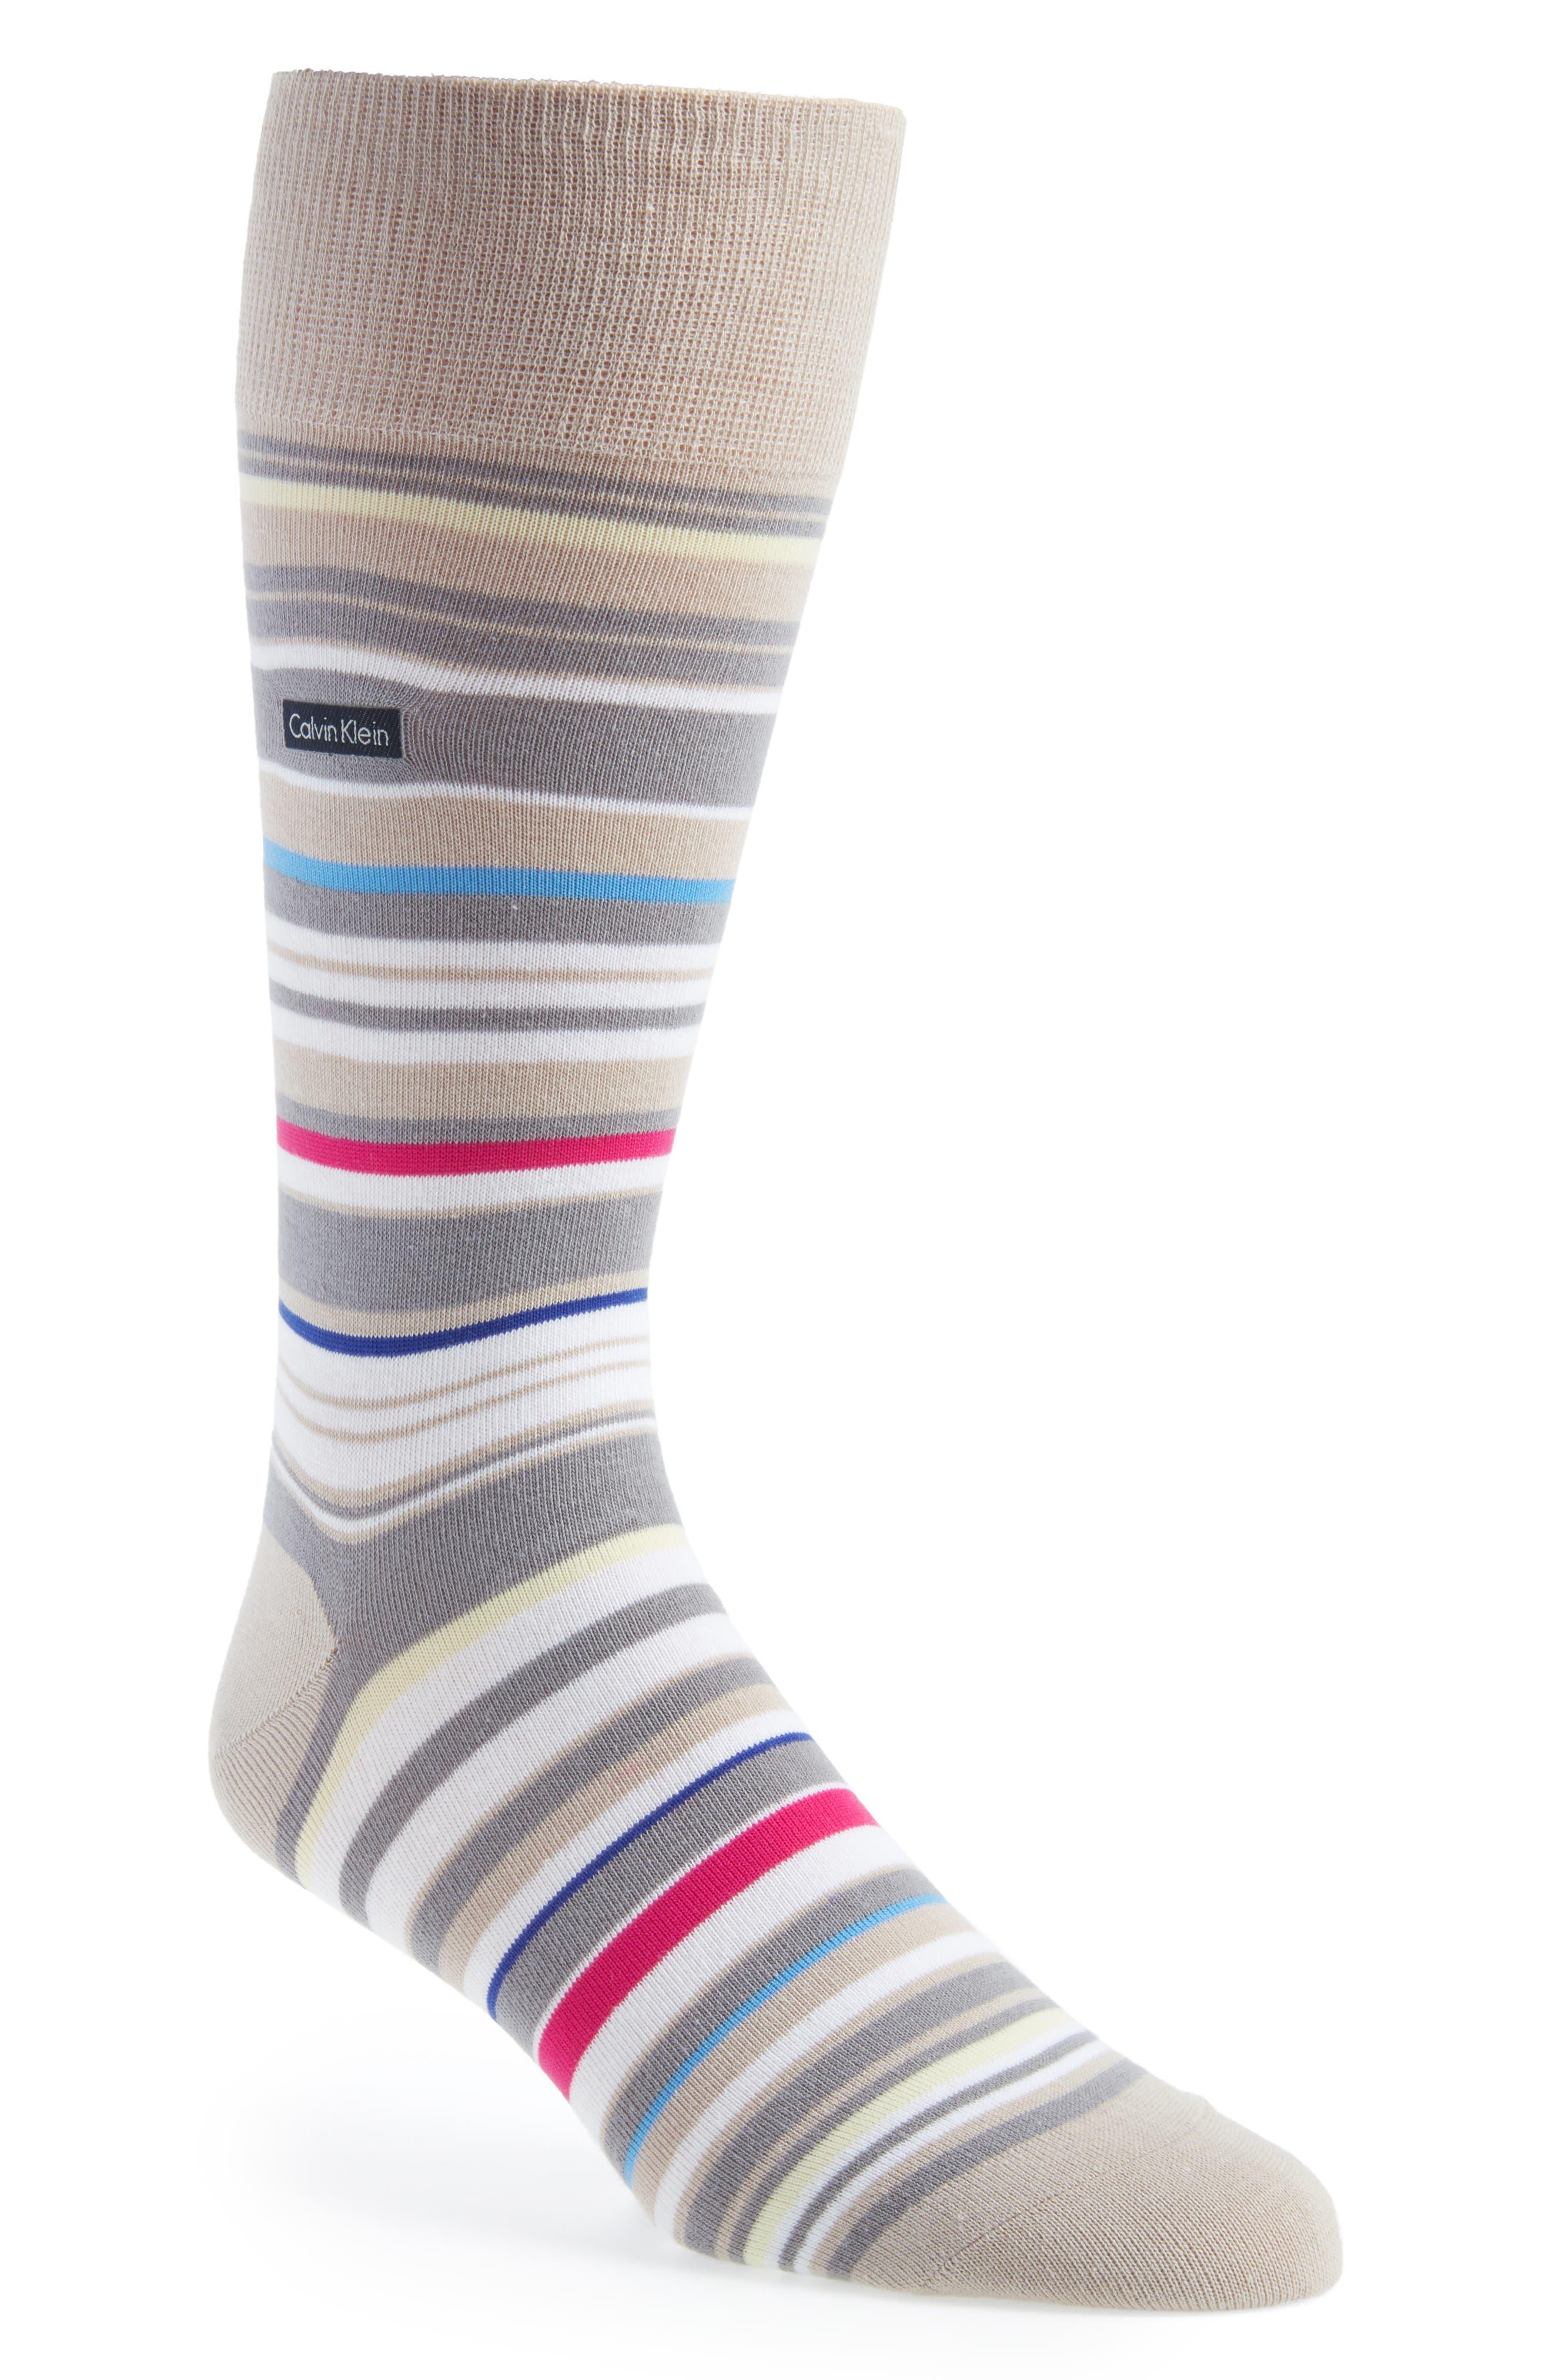 Multistripe Emblem Socks,                         Main,                         color, 051